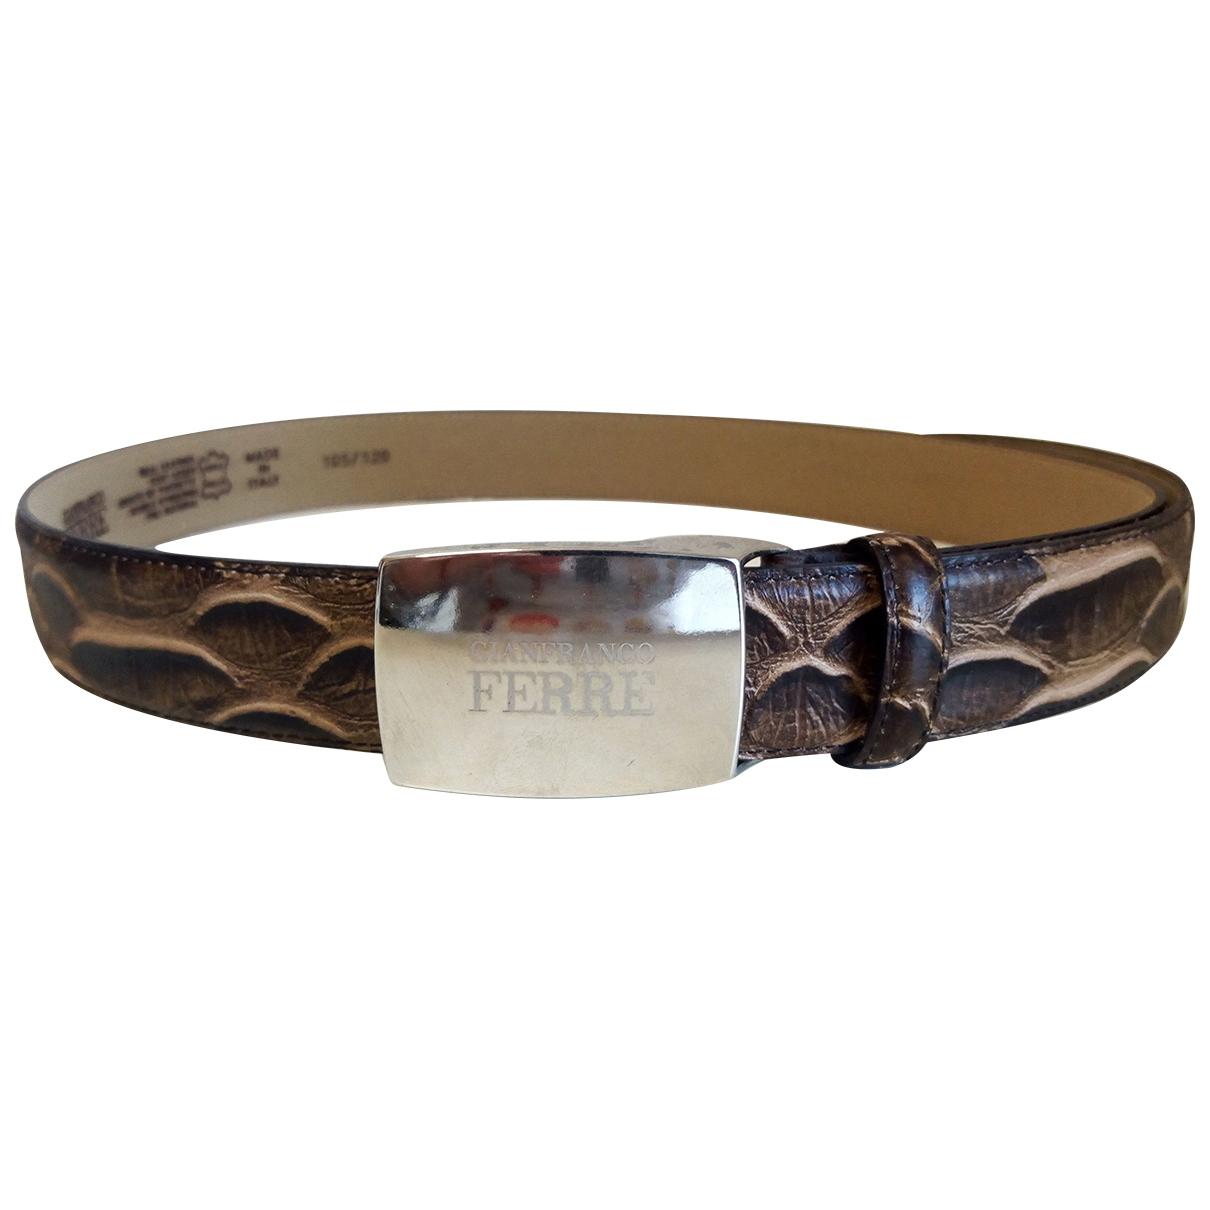 Gianfranco Ferré \N Brown Python belt for Men M international